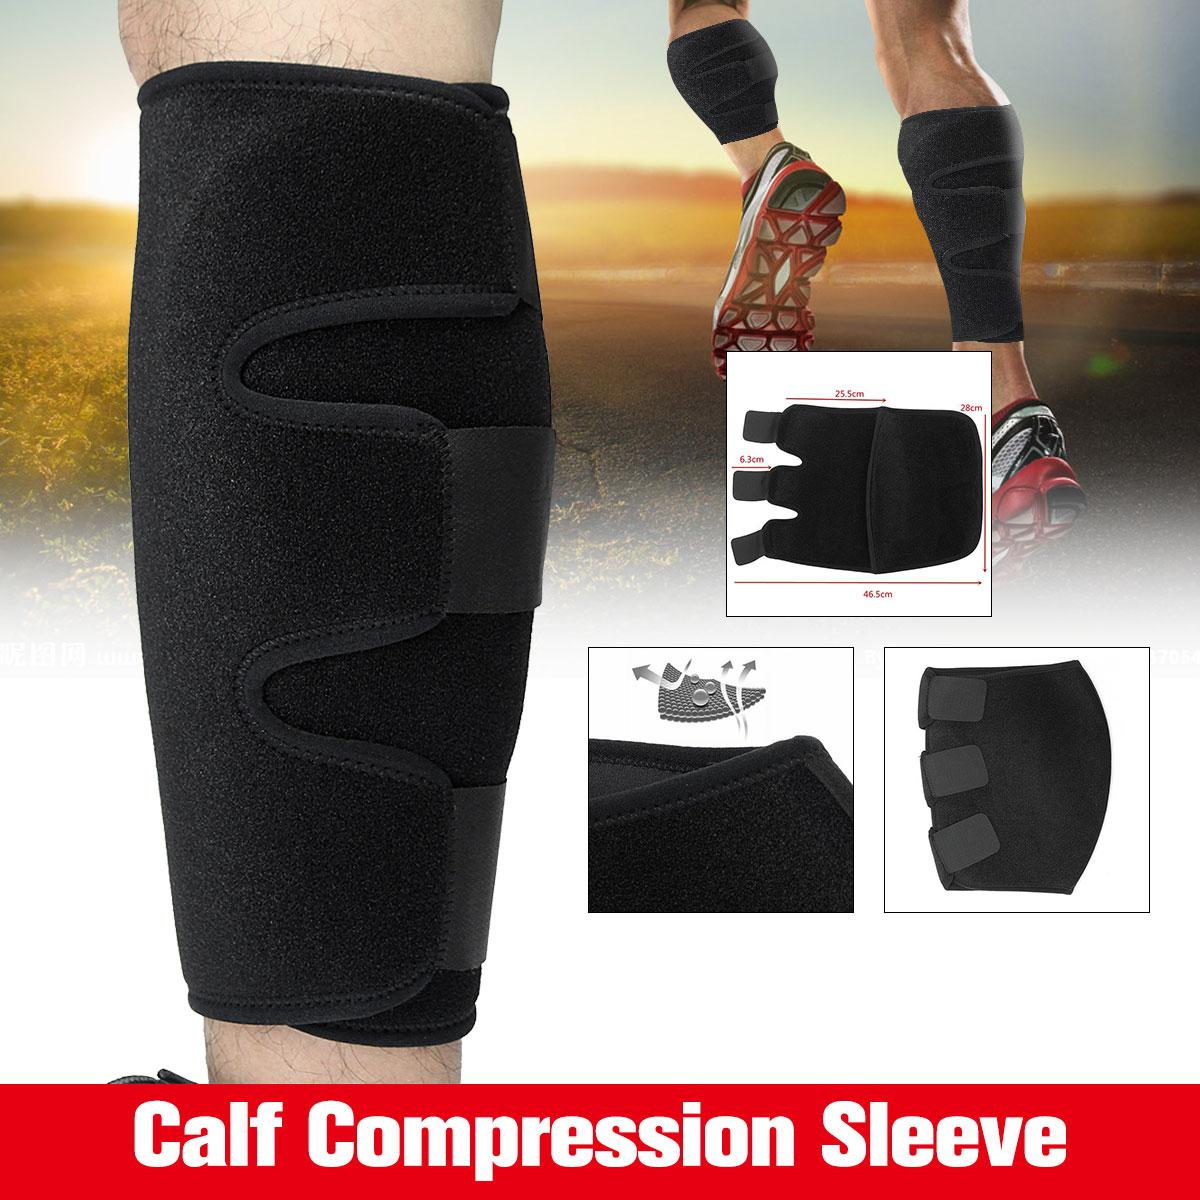 103957b380 1Pc Unisex Neoprene Polyester Sport Running Calf Compression Brace Shin  Splint Sleeve Support Lower Leg Wrap Muscle Pain Relief-in Shin Guard from  Sports ...